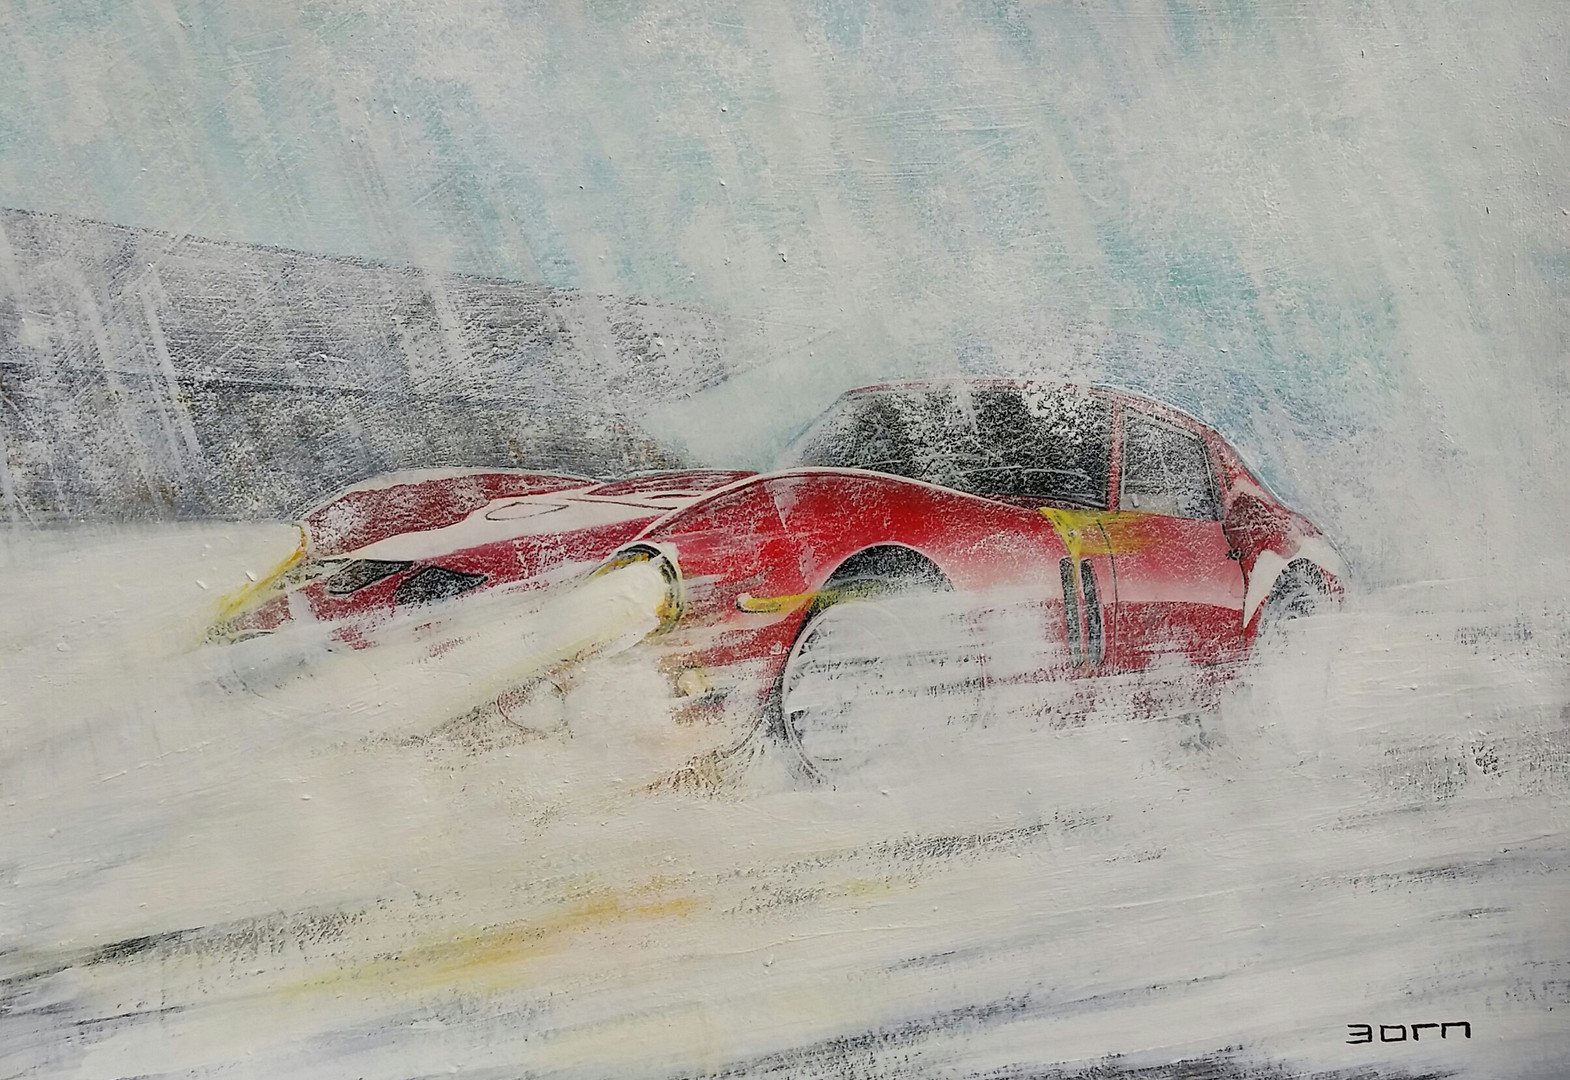 FERRARI-GTO-BILD-ZORA.jpg